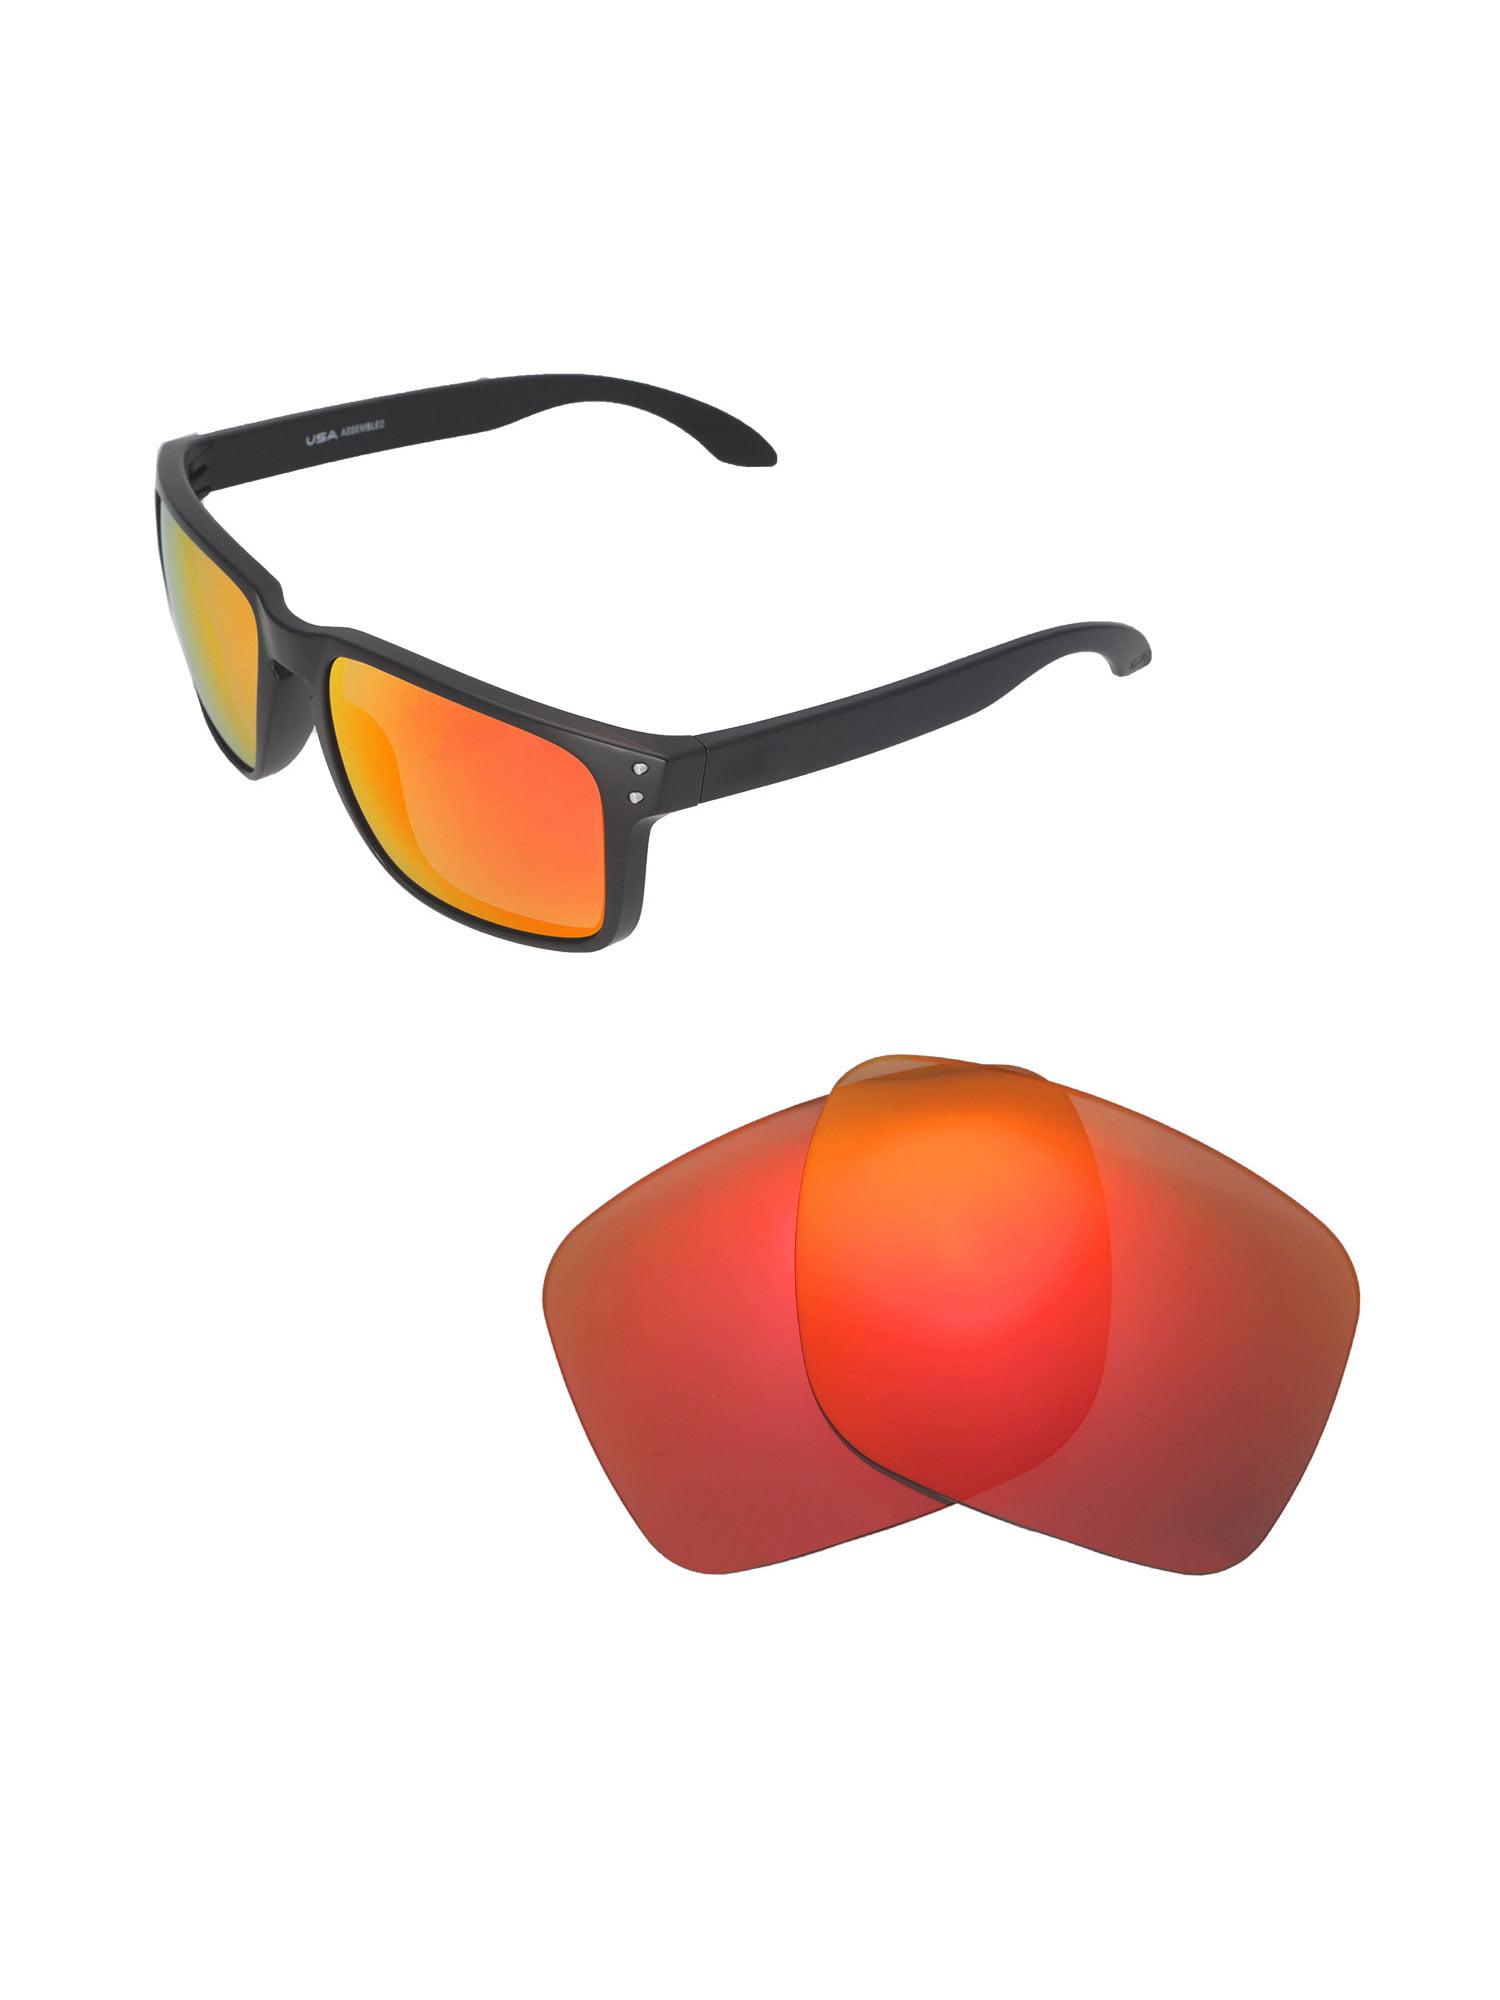 ca0716f8e0b Walleva - Walleva Brown Polarized Replacement Lenses for Oakley Holbrook XL  Sunglasses - Walmart.com